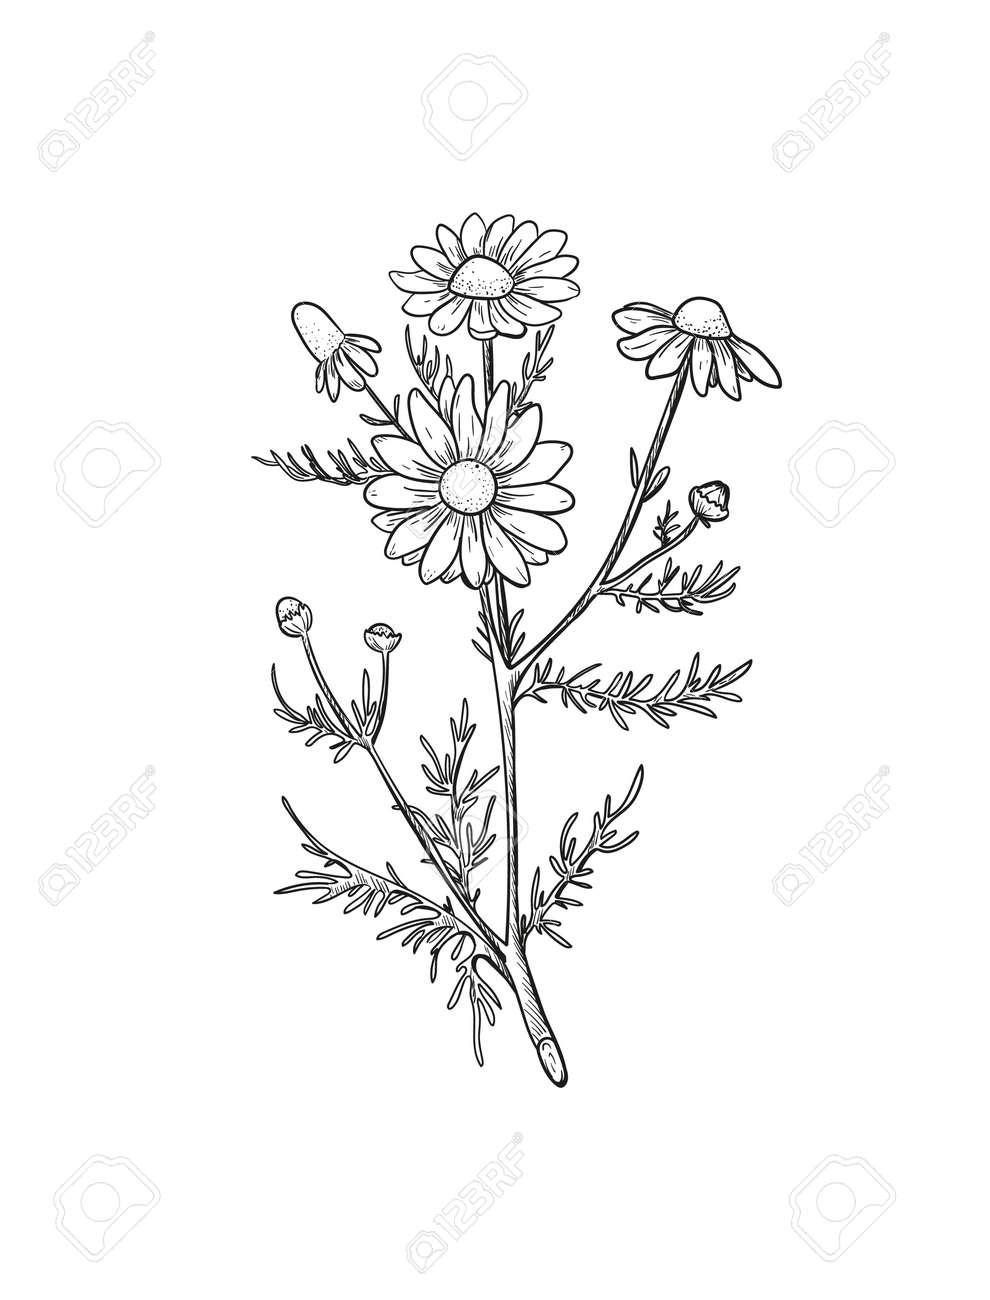 Vector Chamomile sketch. Botanical engraved art daisy flowers. Matricaria chamomilla medicinal plant hand drawn illustration. - 170385220